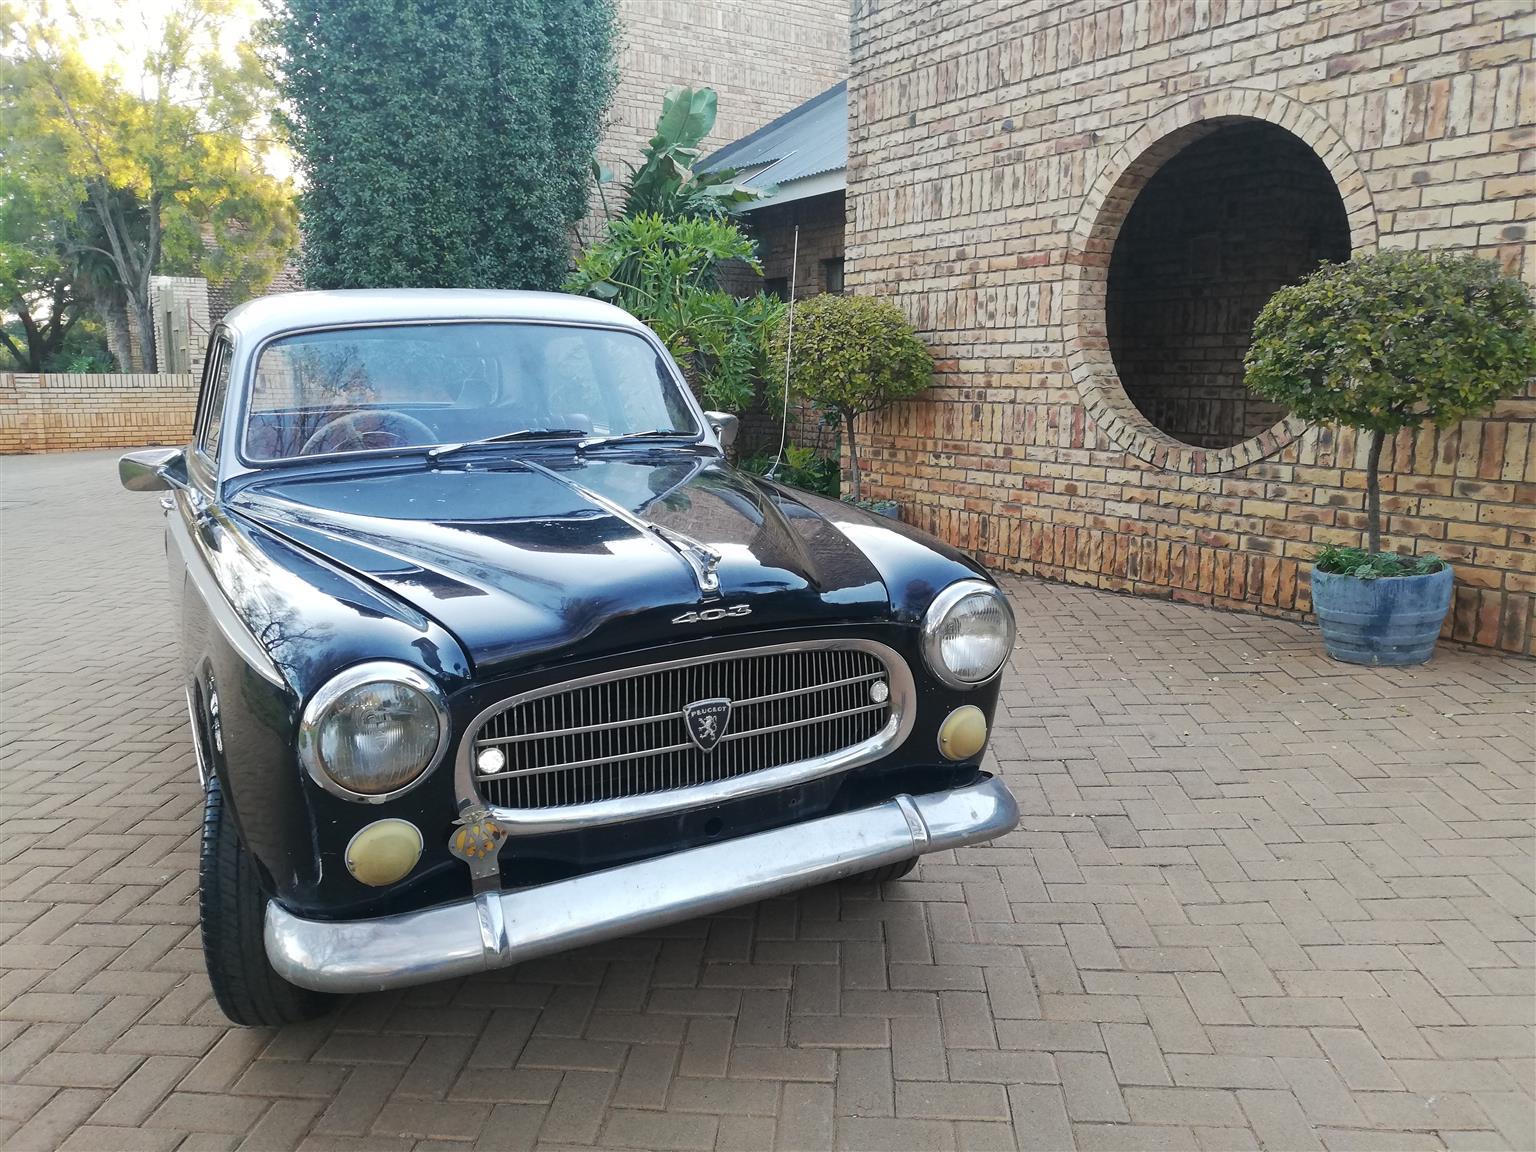 Peugeot 403 for sale